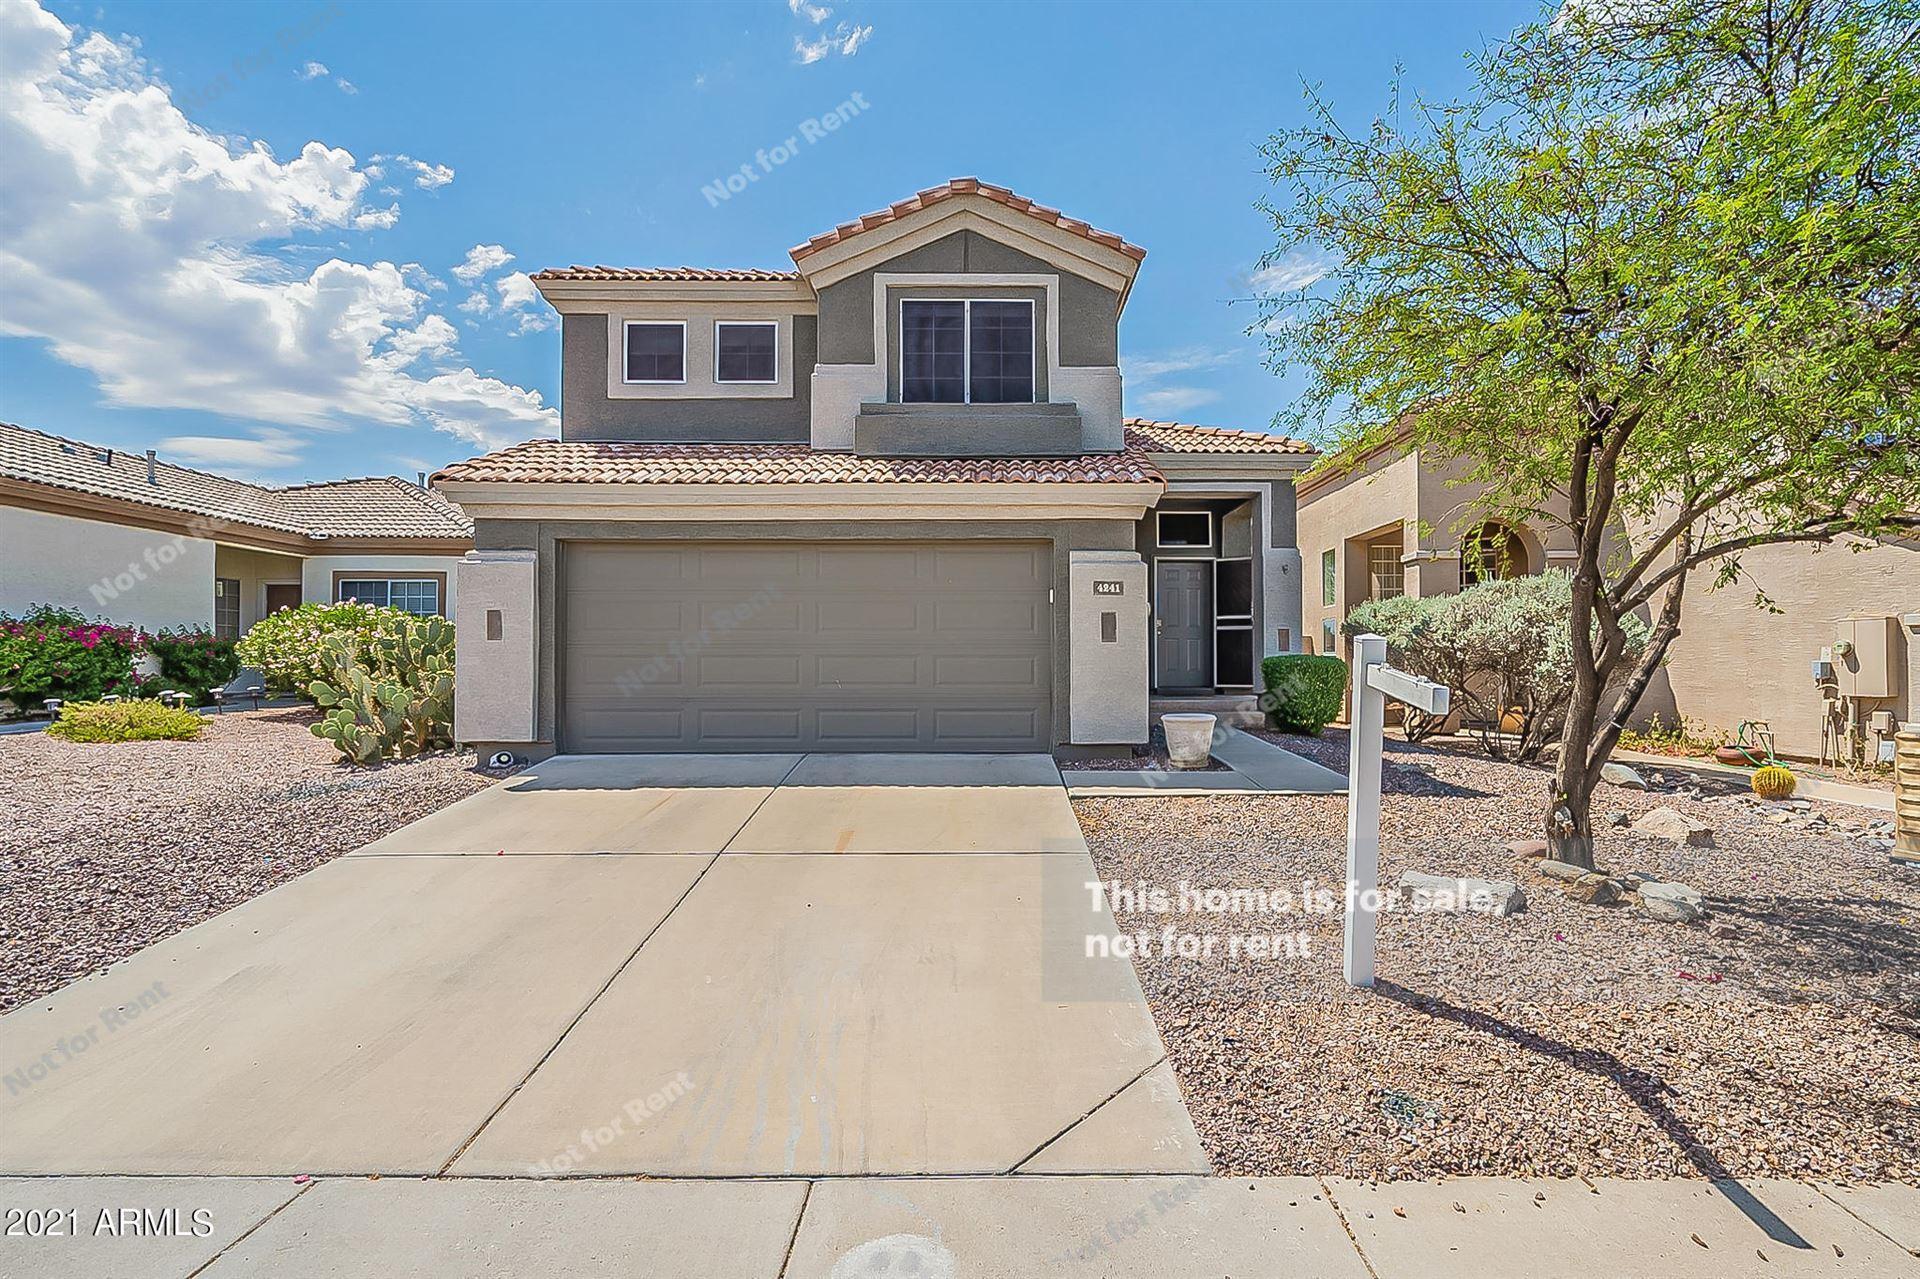 4241 E CASCALOTE Drive, Cave Creek, AZ 85331 - MLS#: 6246653